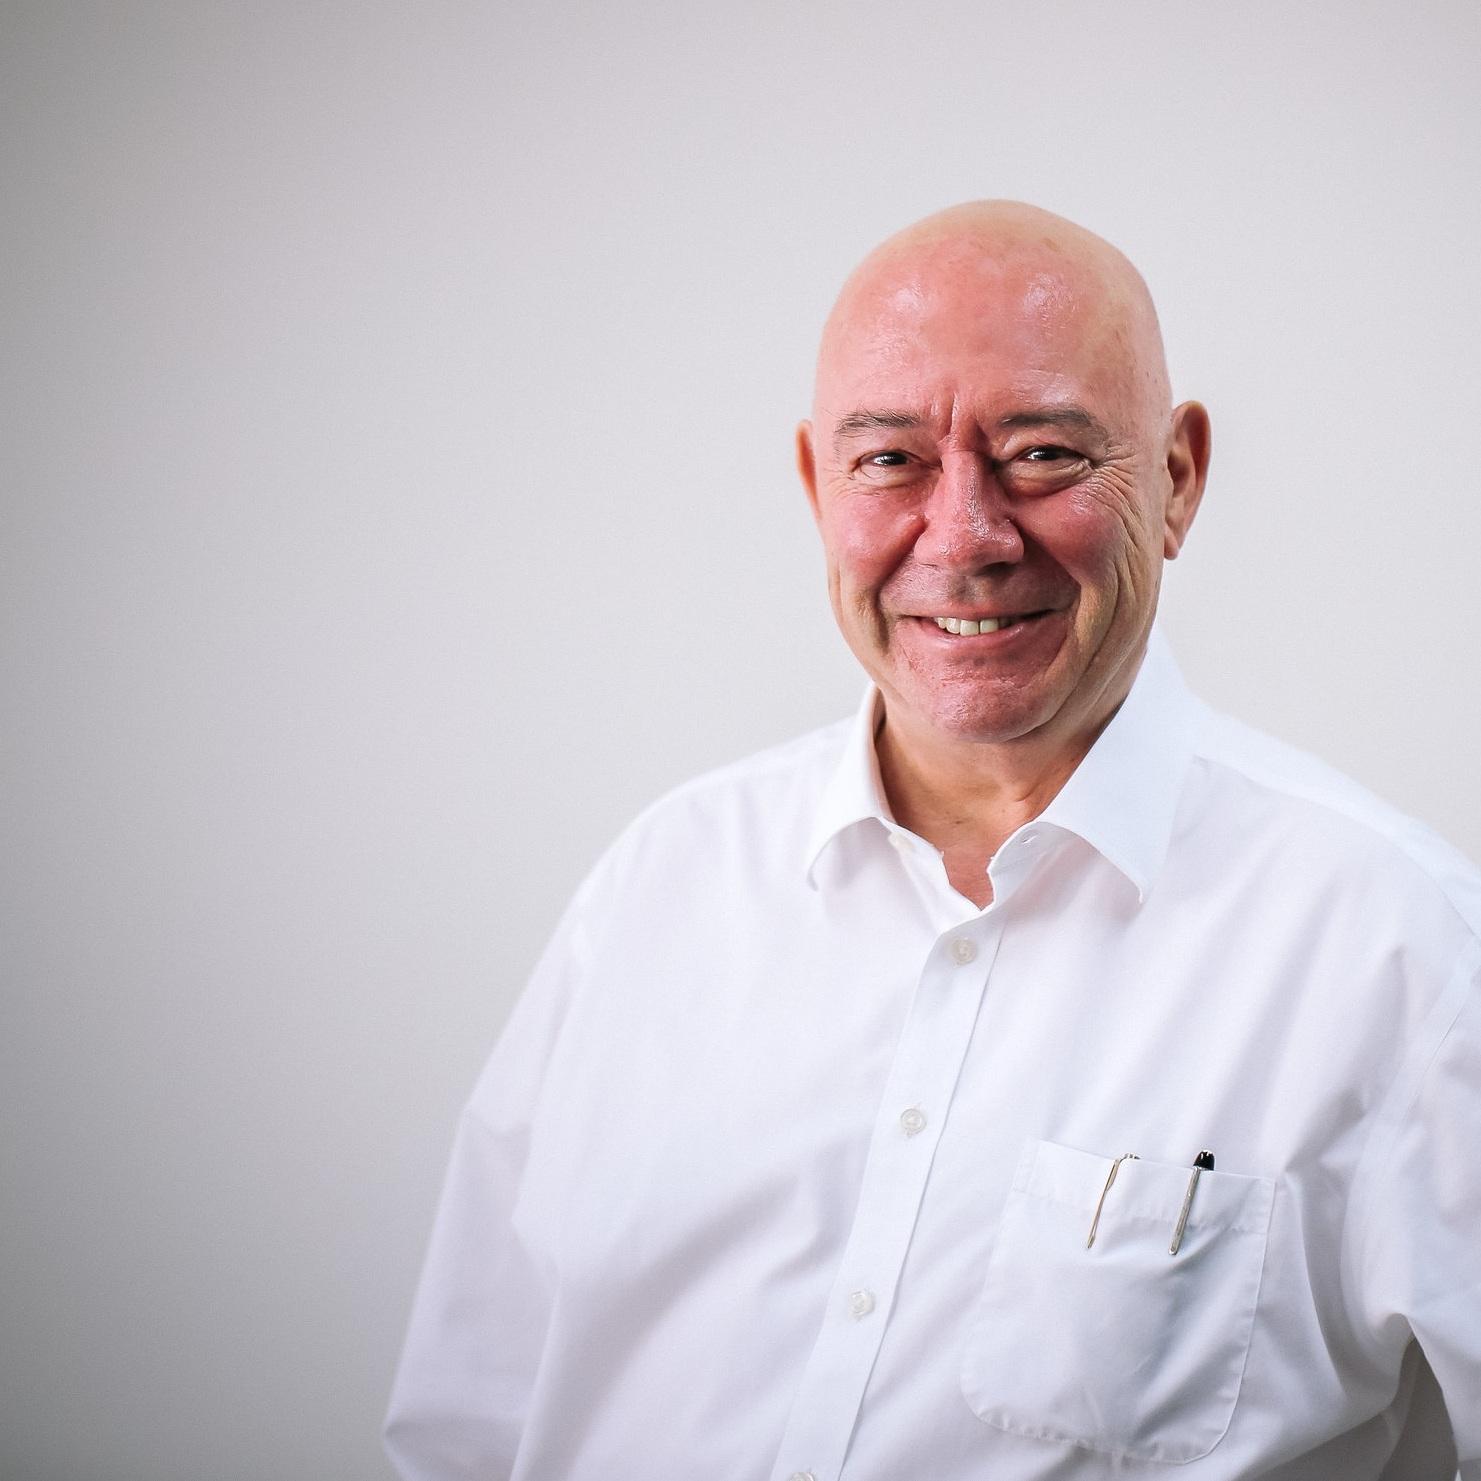 Charles Glanville - Director